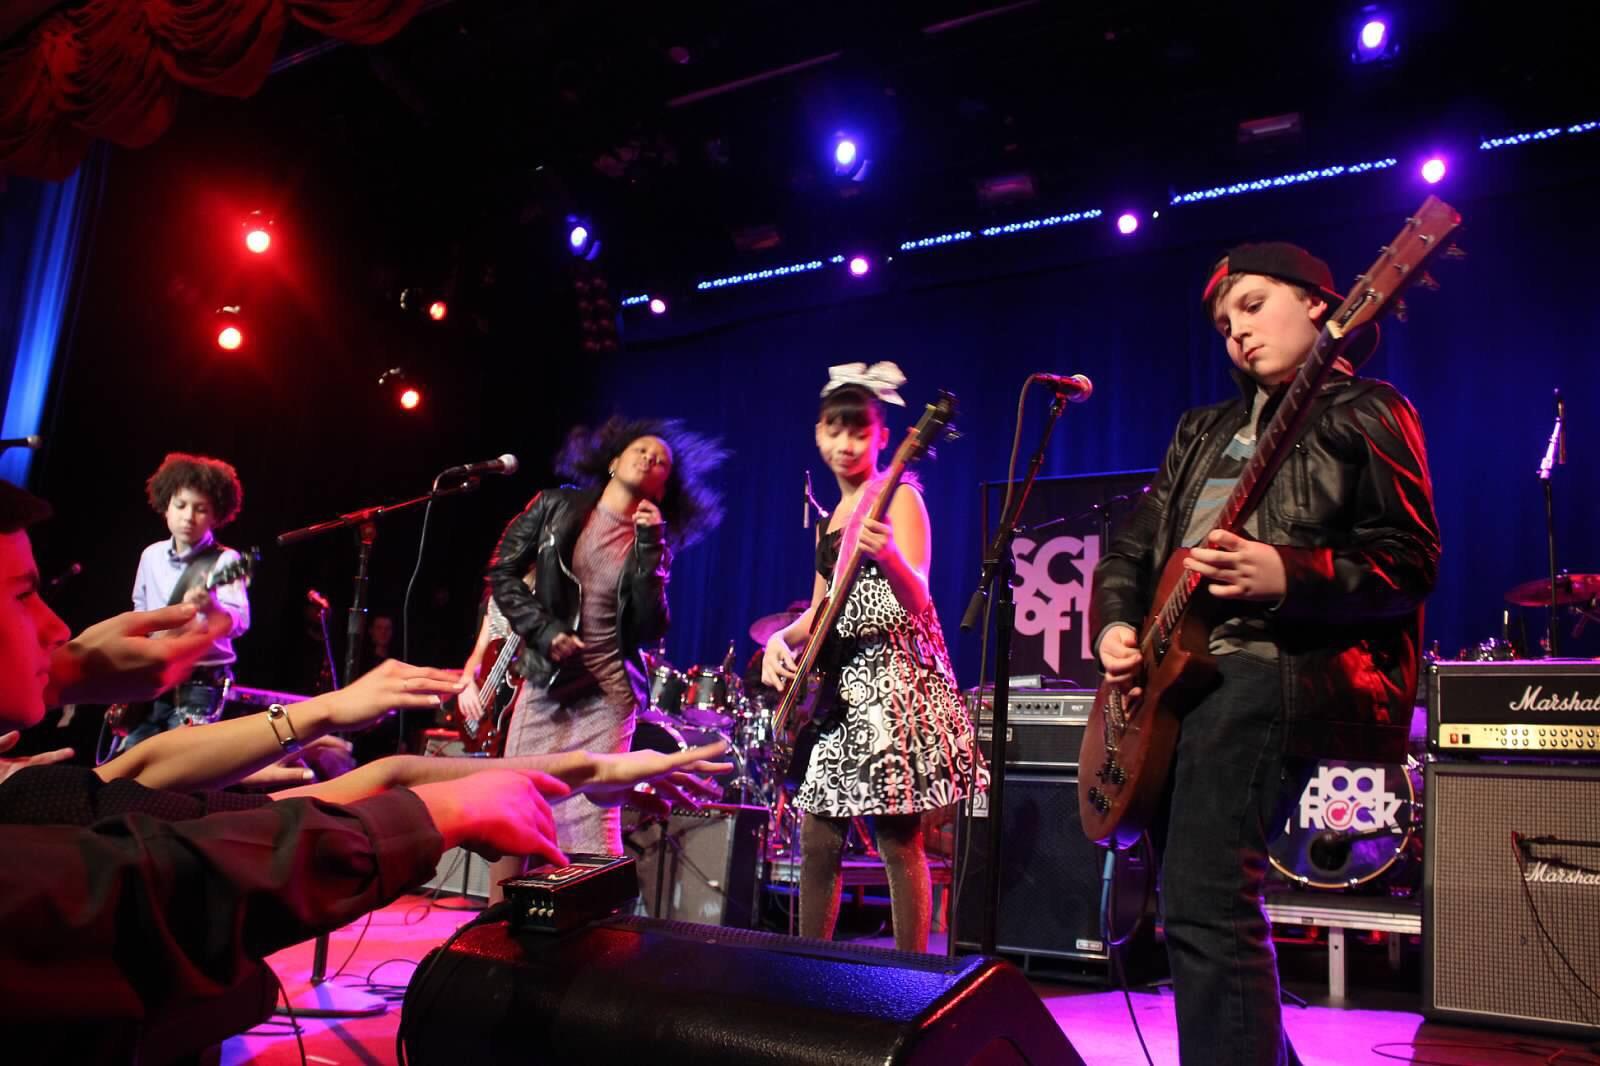 Jersey-Sullivan_hard-rock-cafe-benefit-guitar-2.jpg